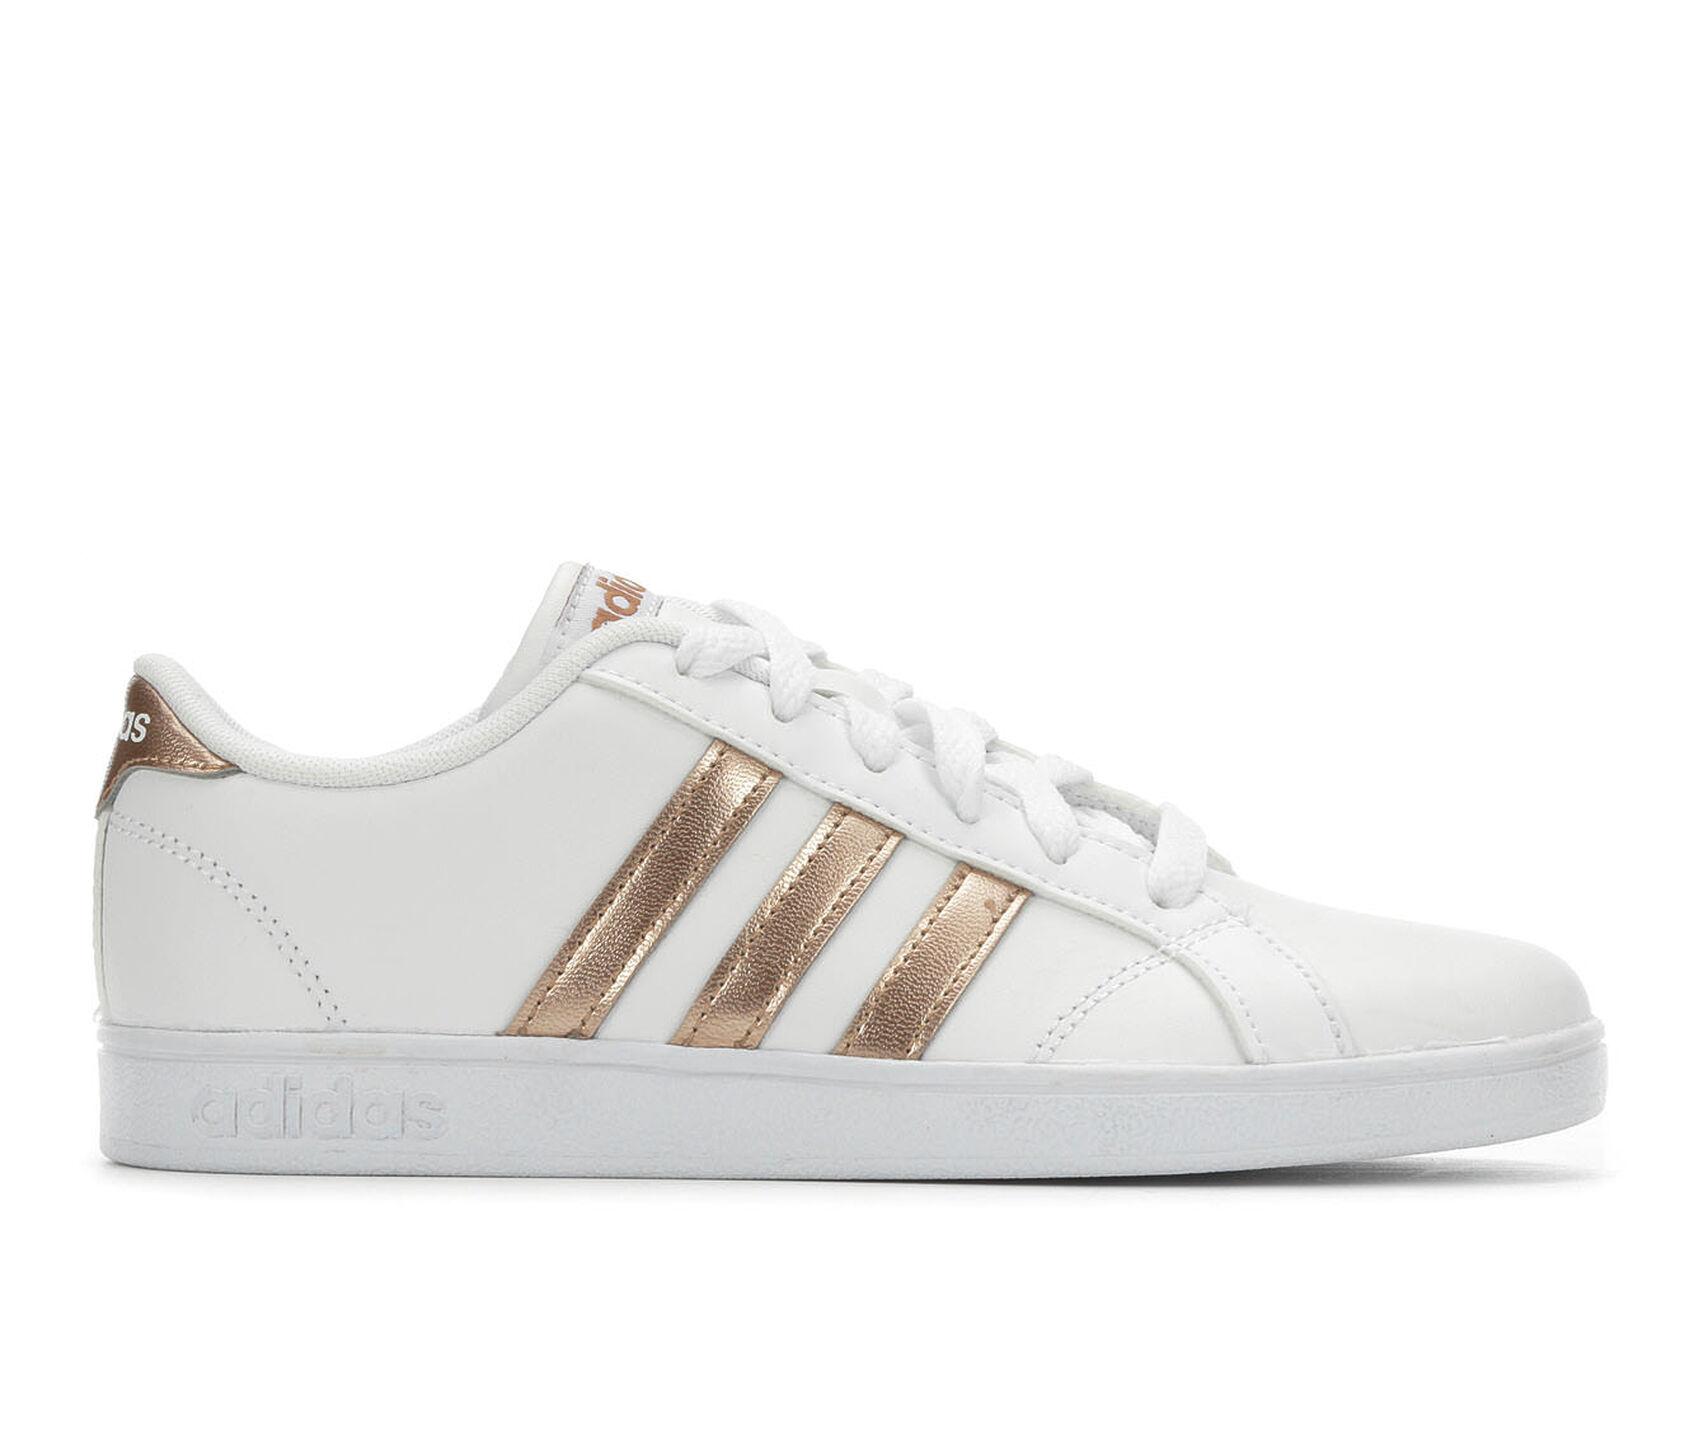 c8a9b91abb86 Girls  Adidas Little Kid   Big Kid Baseline Sneakers